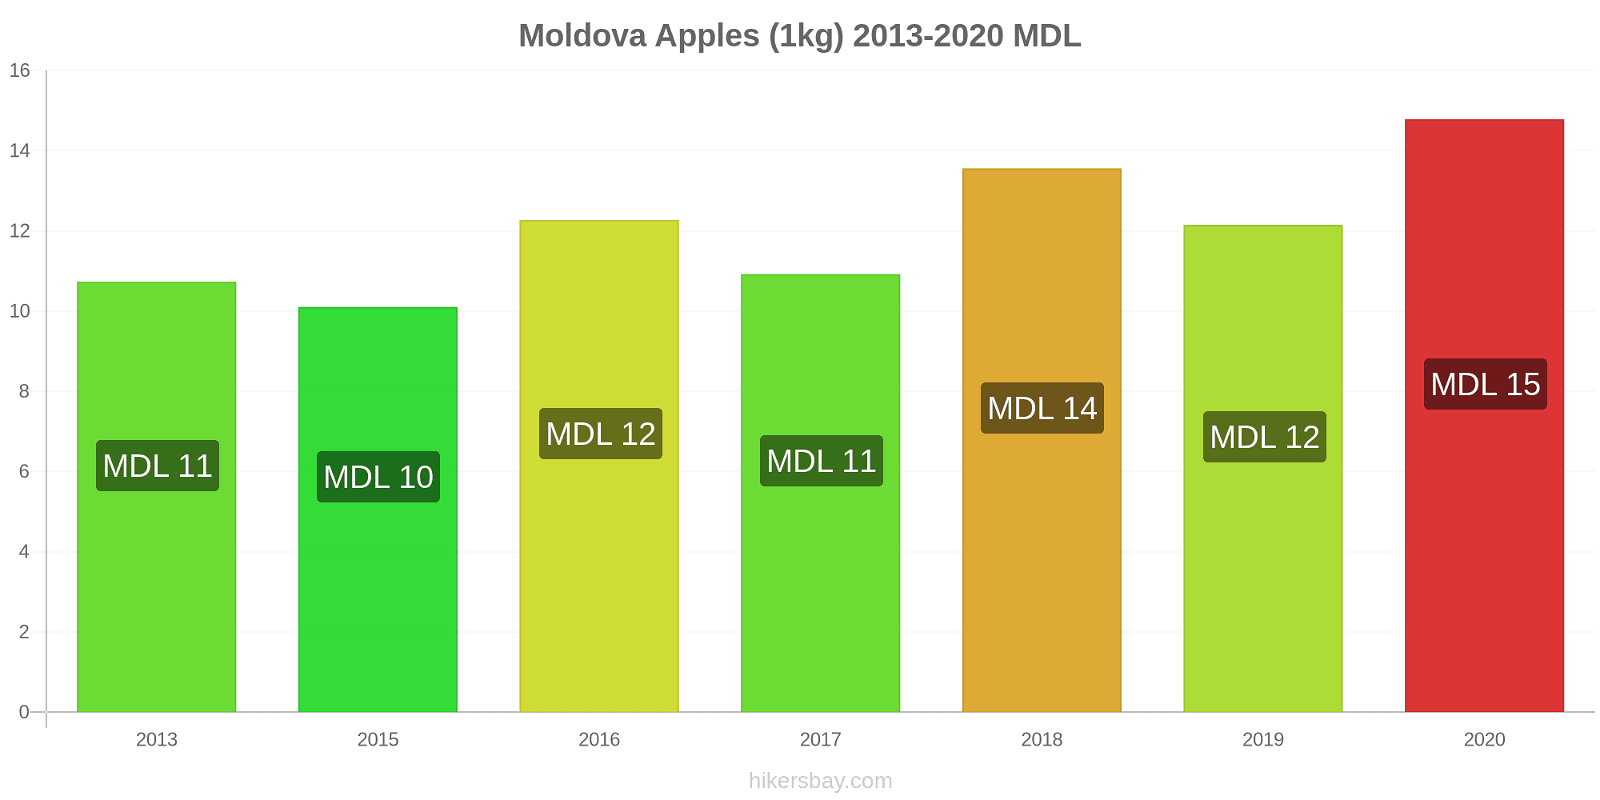 Moldova price changes Apples (1kg) hikersbay.com